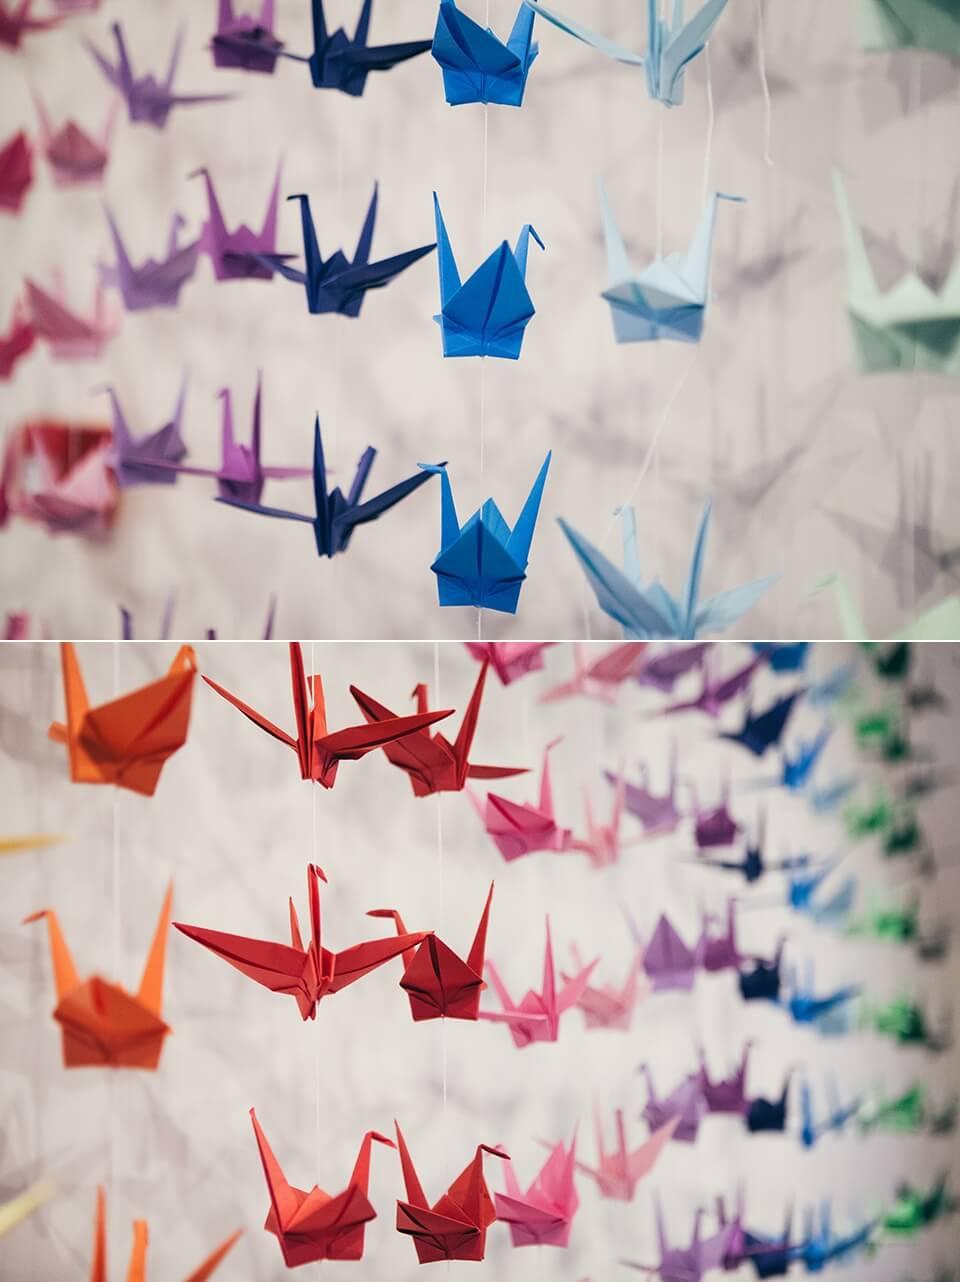 Rainbow Themed Wedding - Origami paper cranes